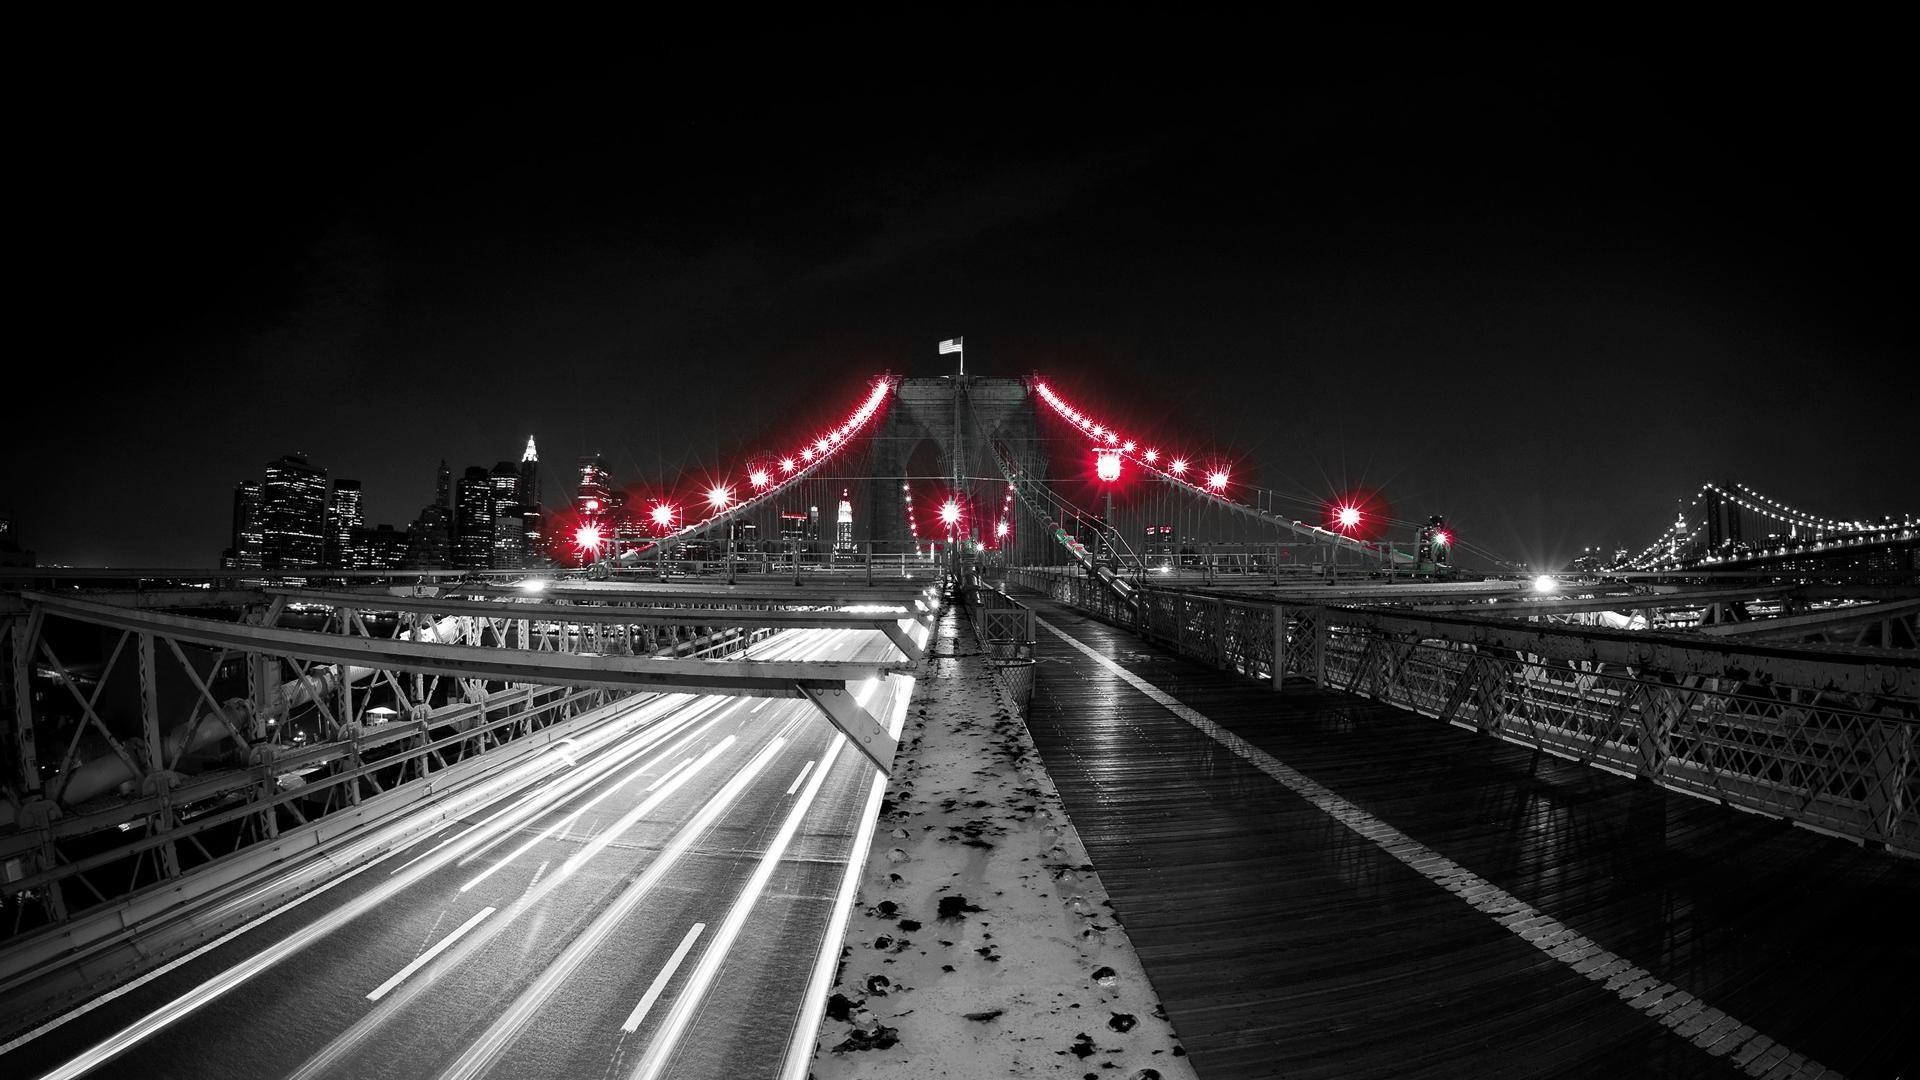 Red Black and White   Black Red Light Bridge White Up Net Wallpaper with  .